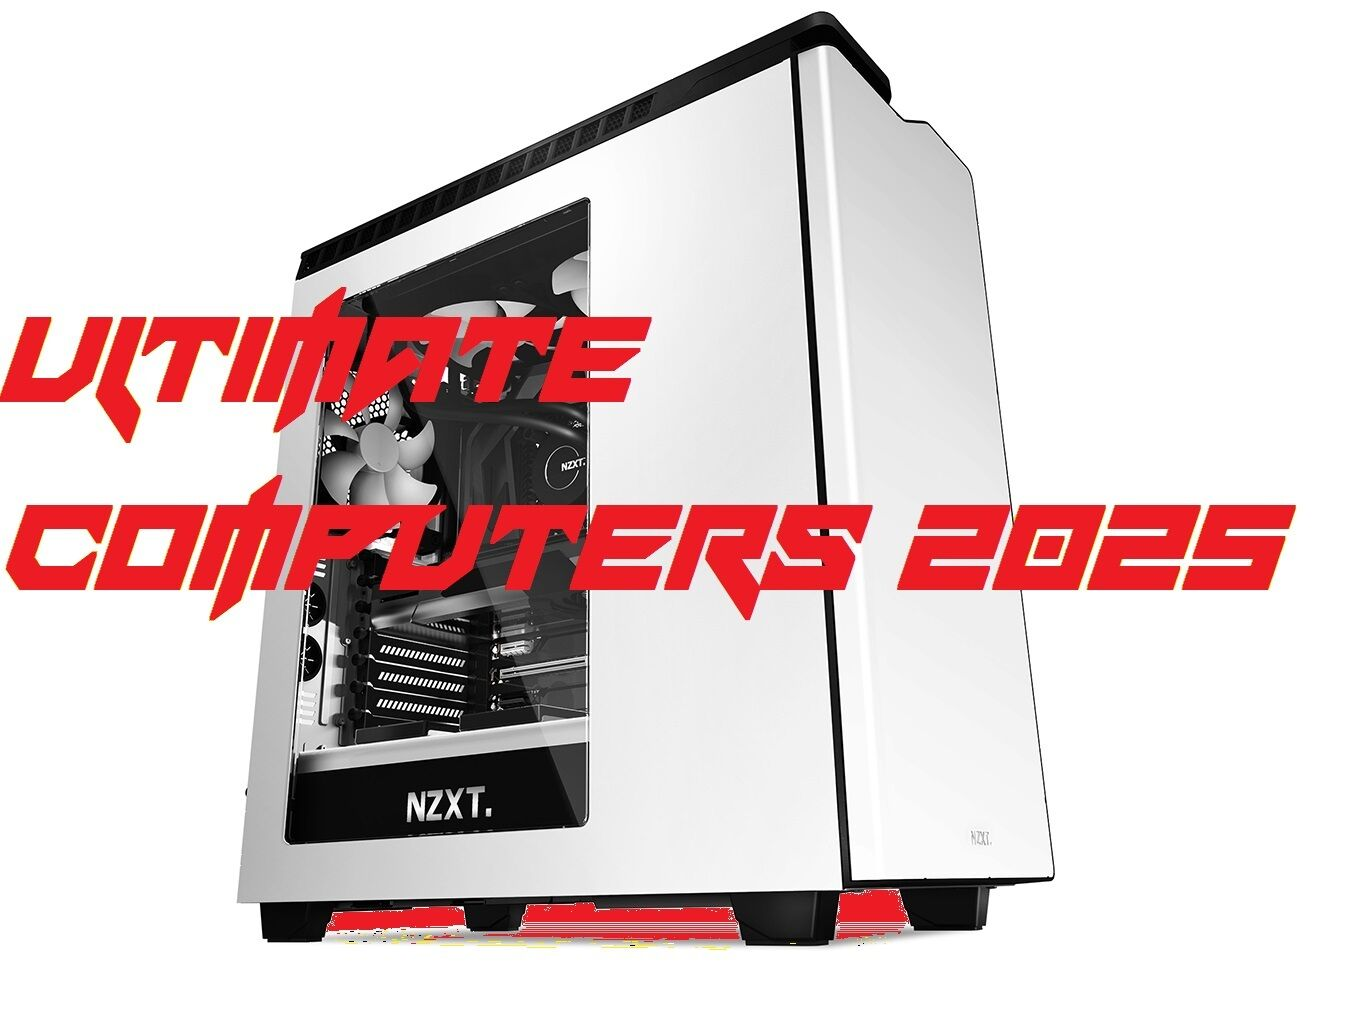 UltimateComputers2025